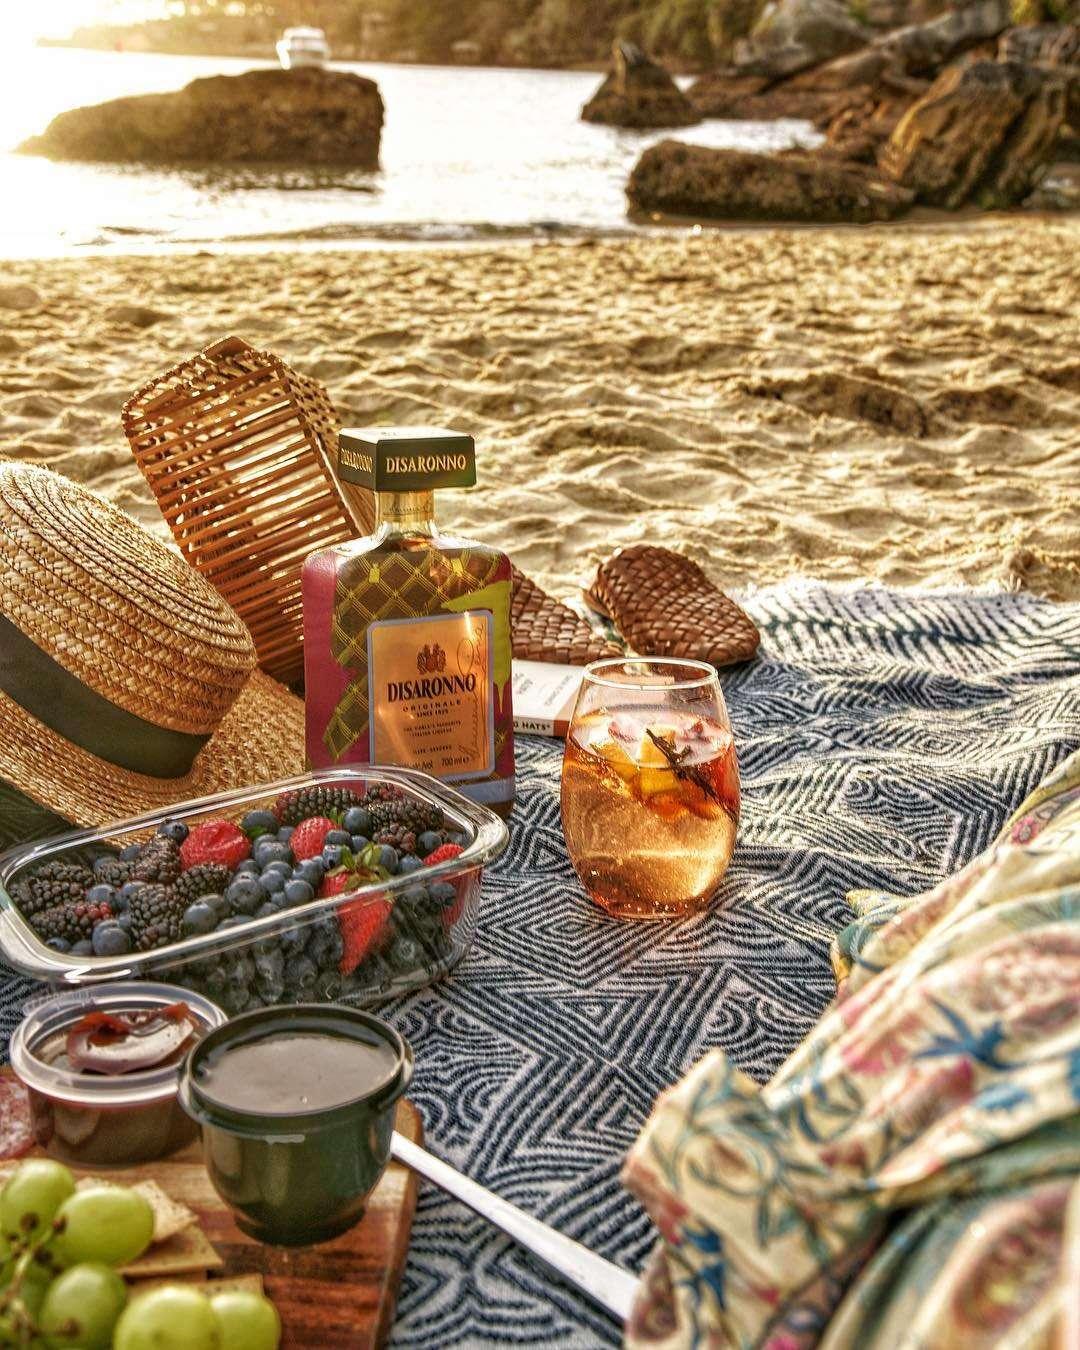 Disaronno x Trussardi, Beach Picnic Inspiration